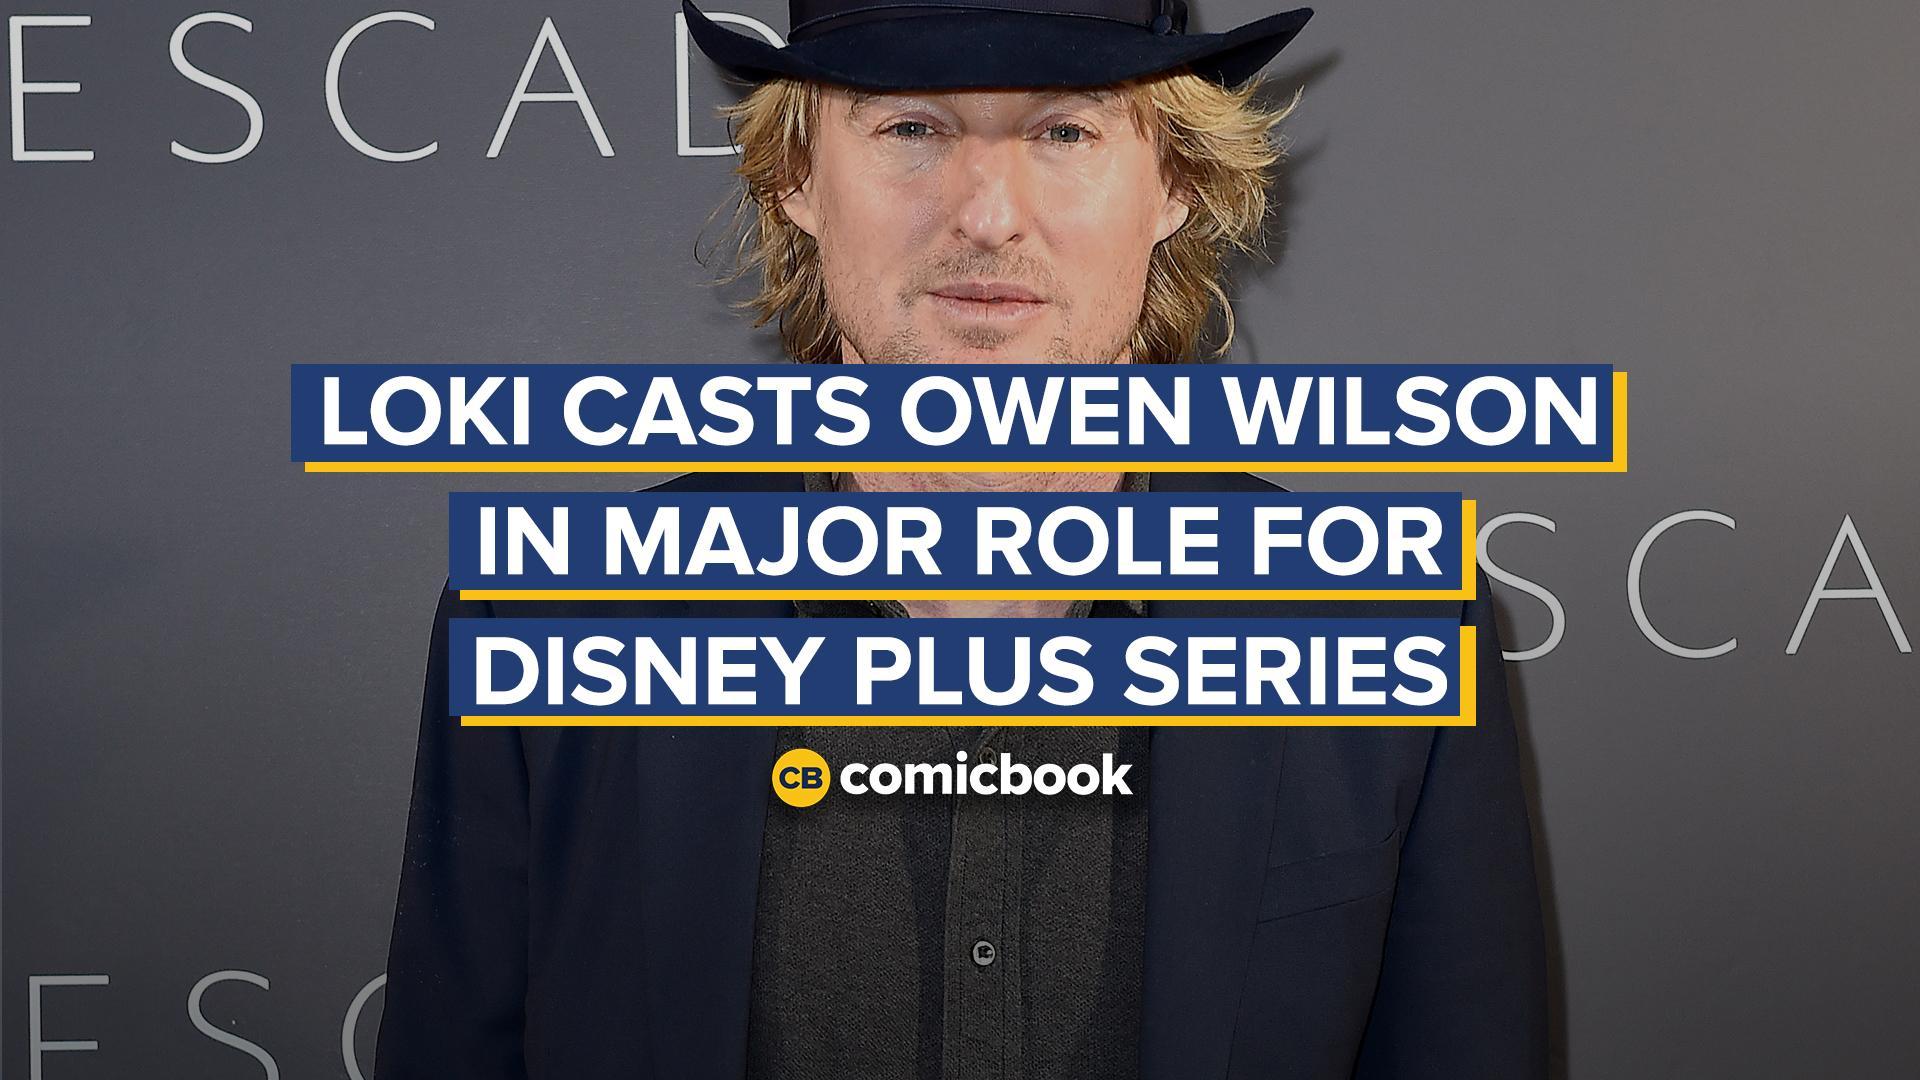 Loki Casts Owen Wilson in Major Role For Disney Plus Series screen capture